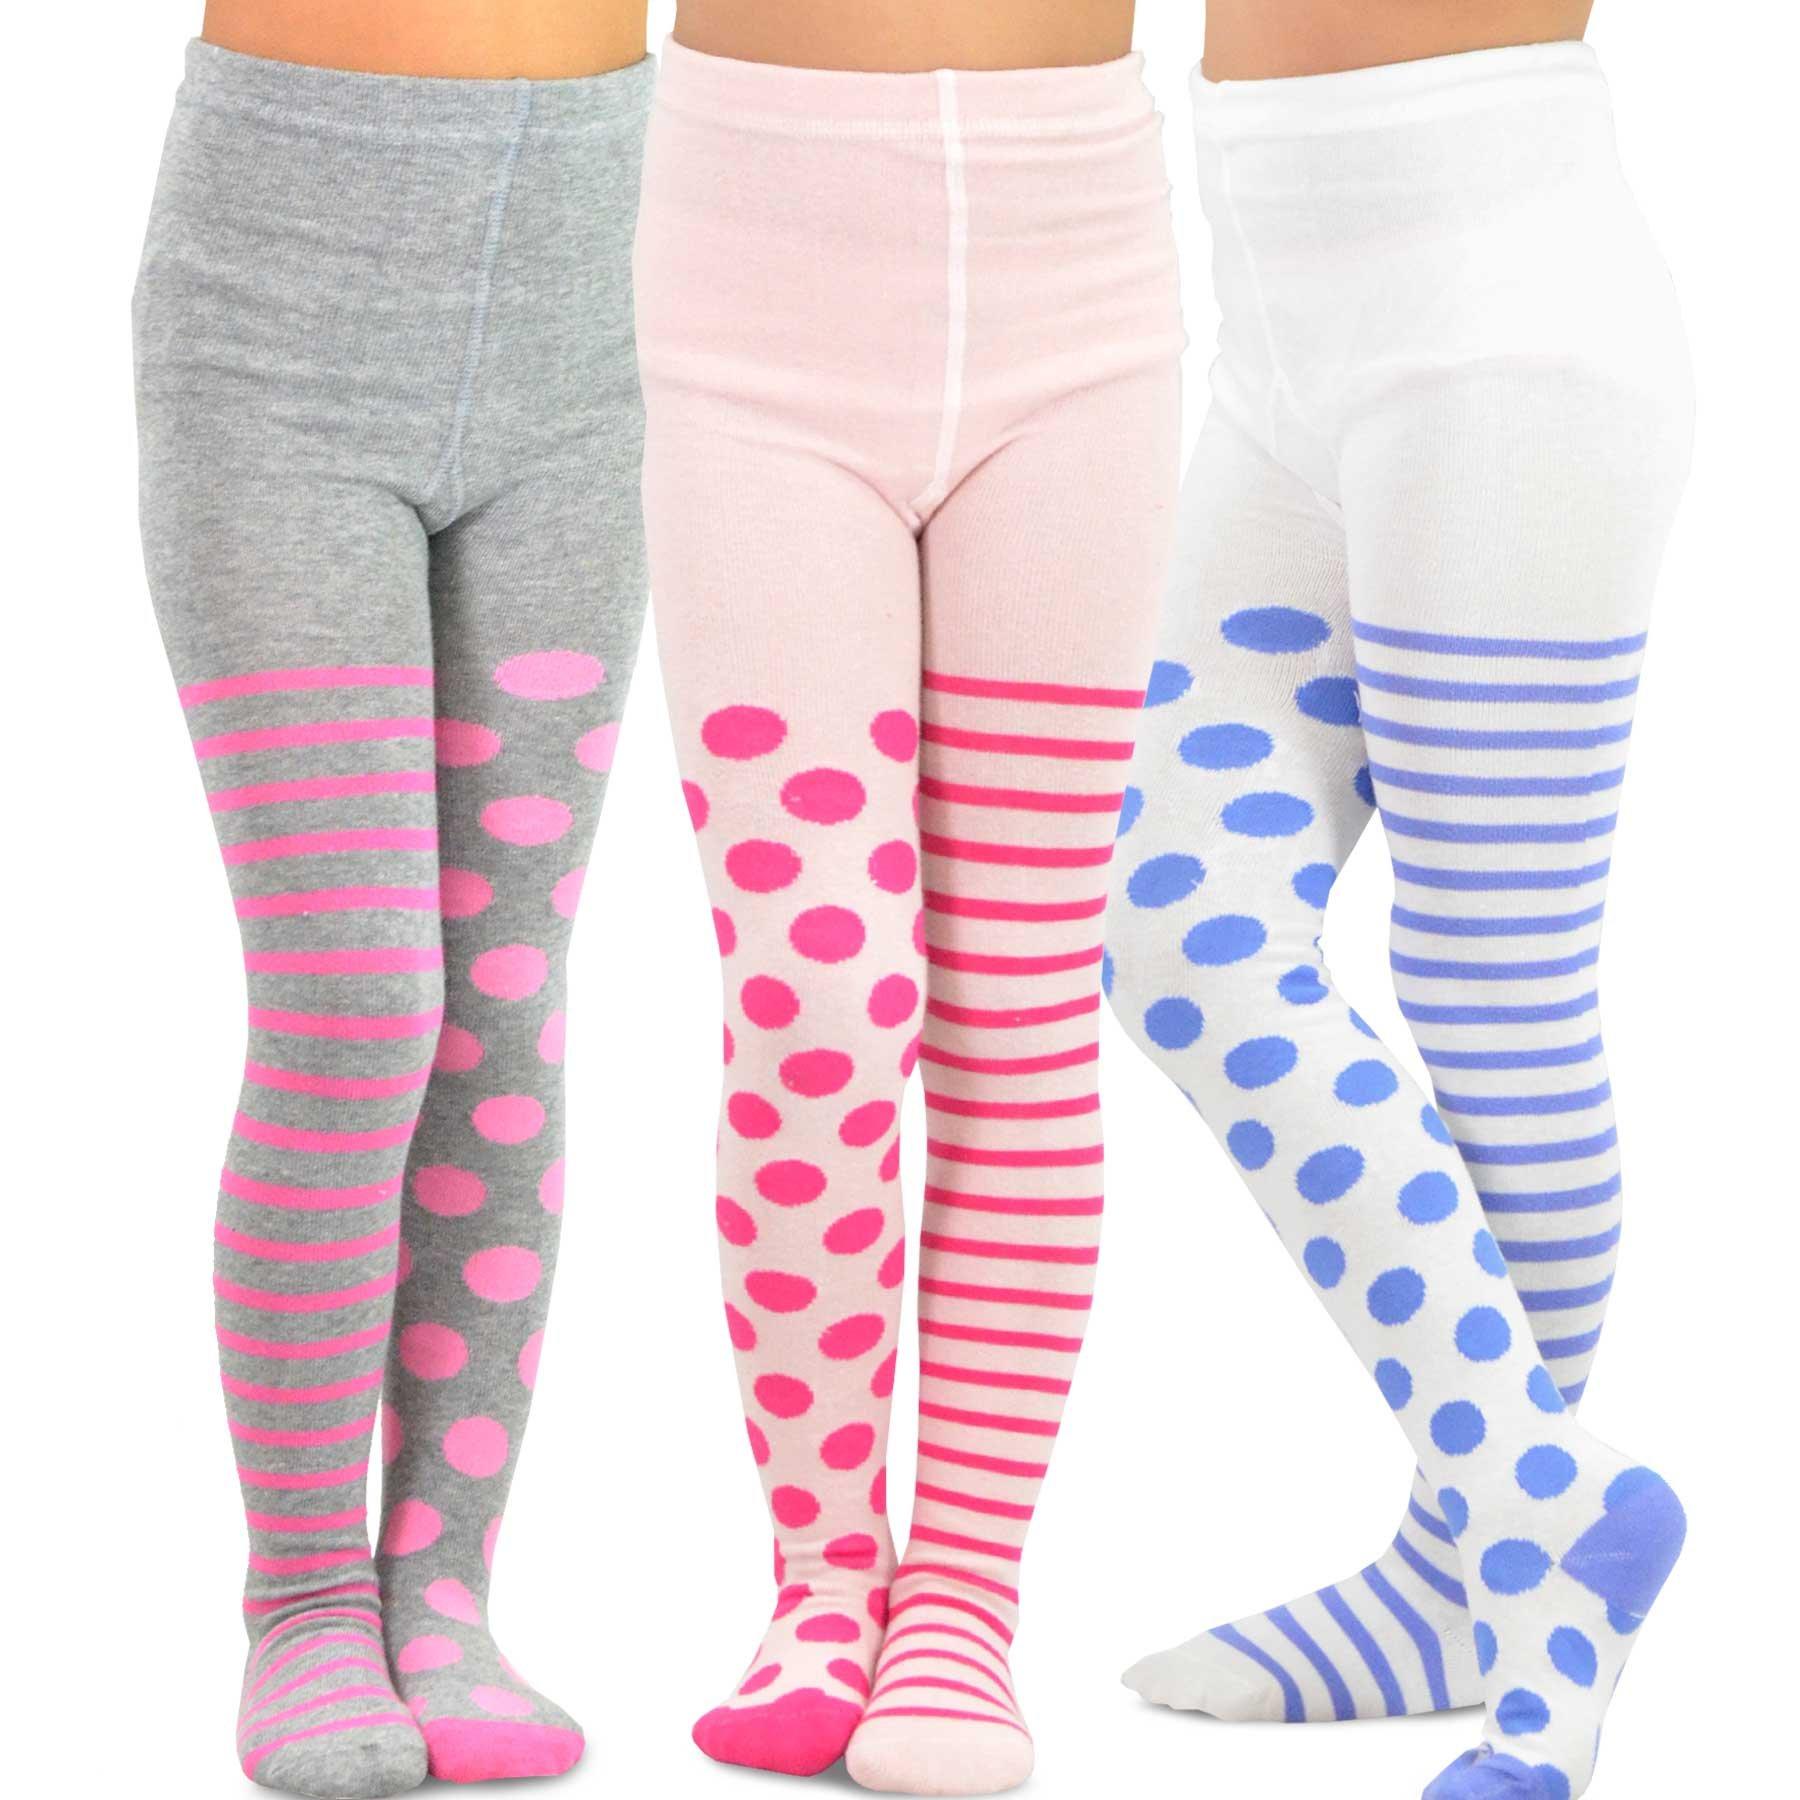 22c34b26ef6f2 Get Quotations · TeeHee (Naartjie) Kids Girls Fashion Cotton Tights 3 Pair  Pack